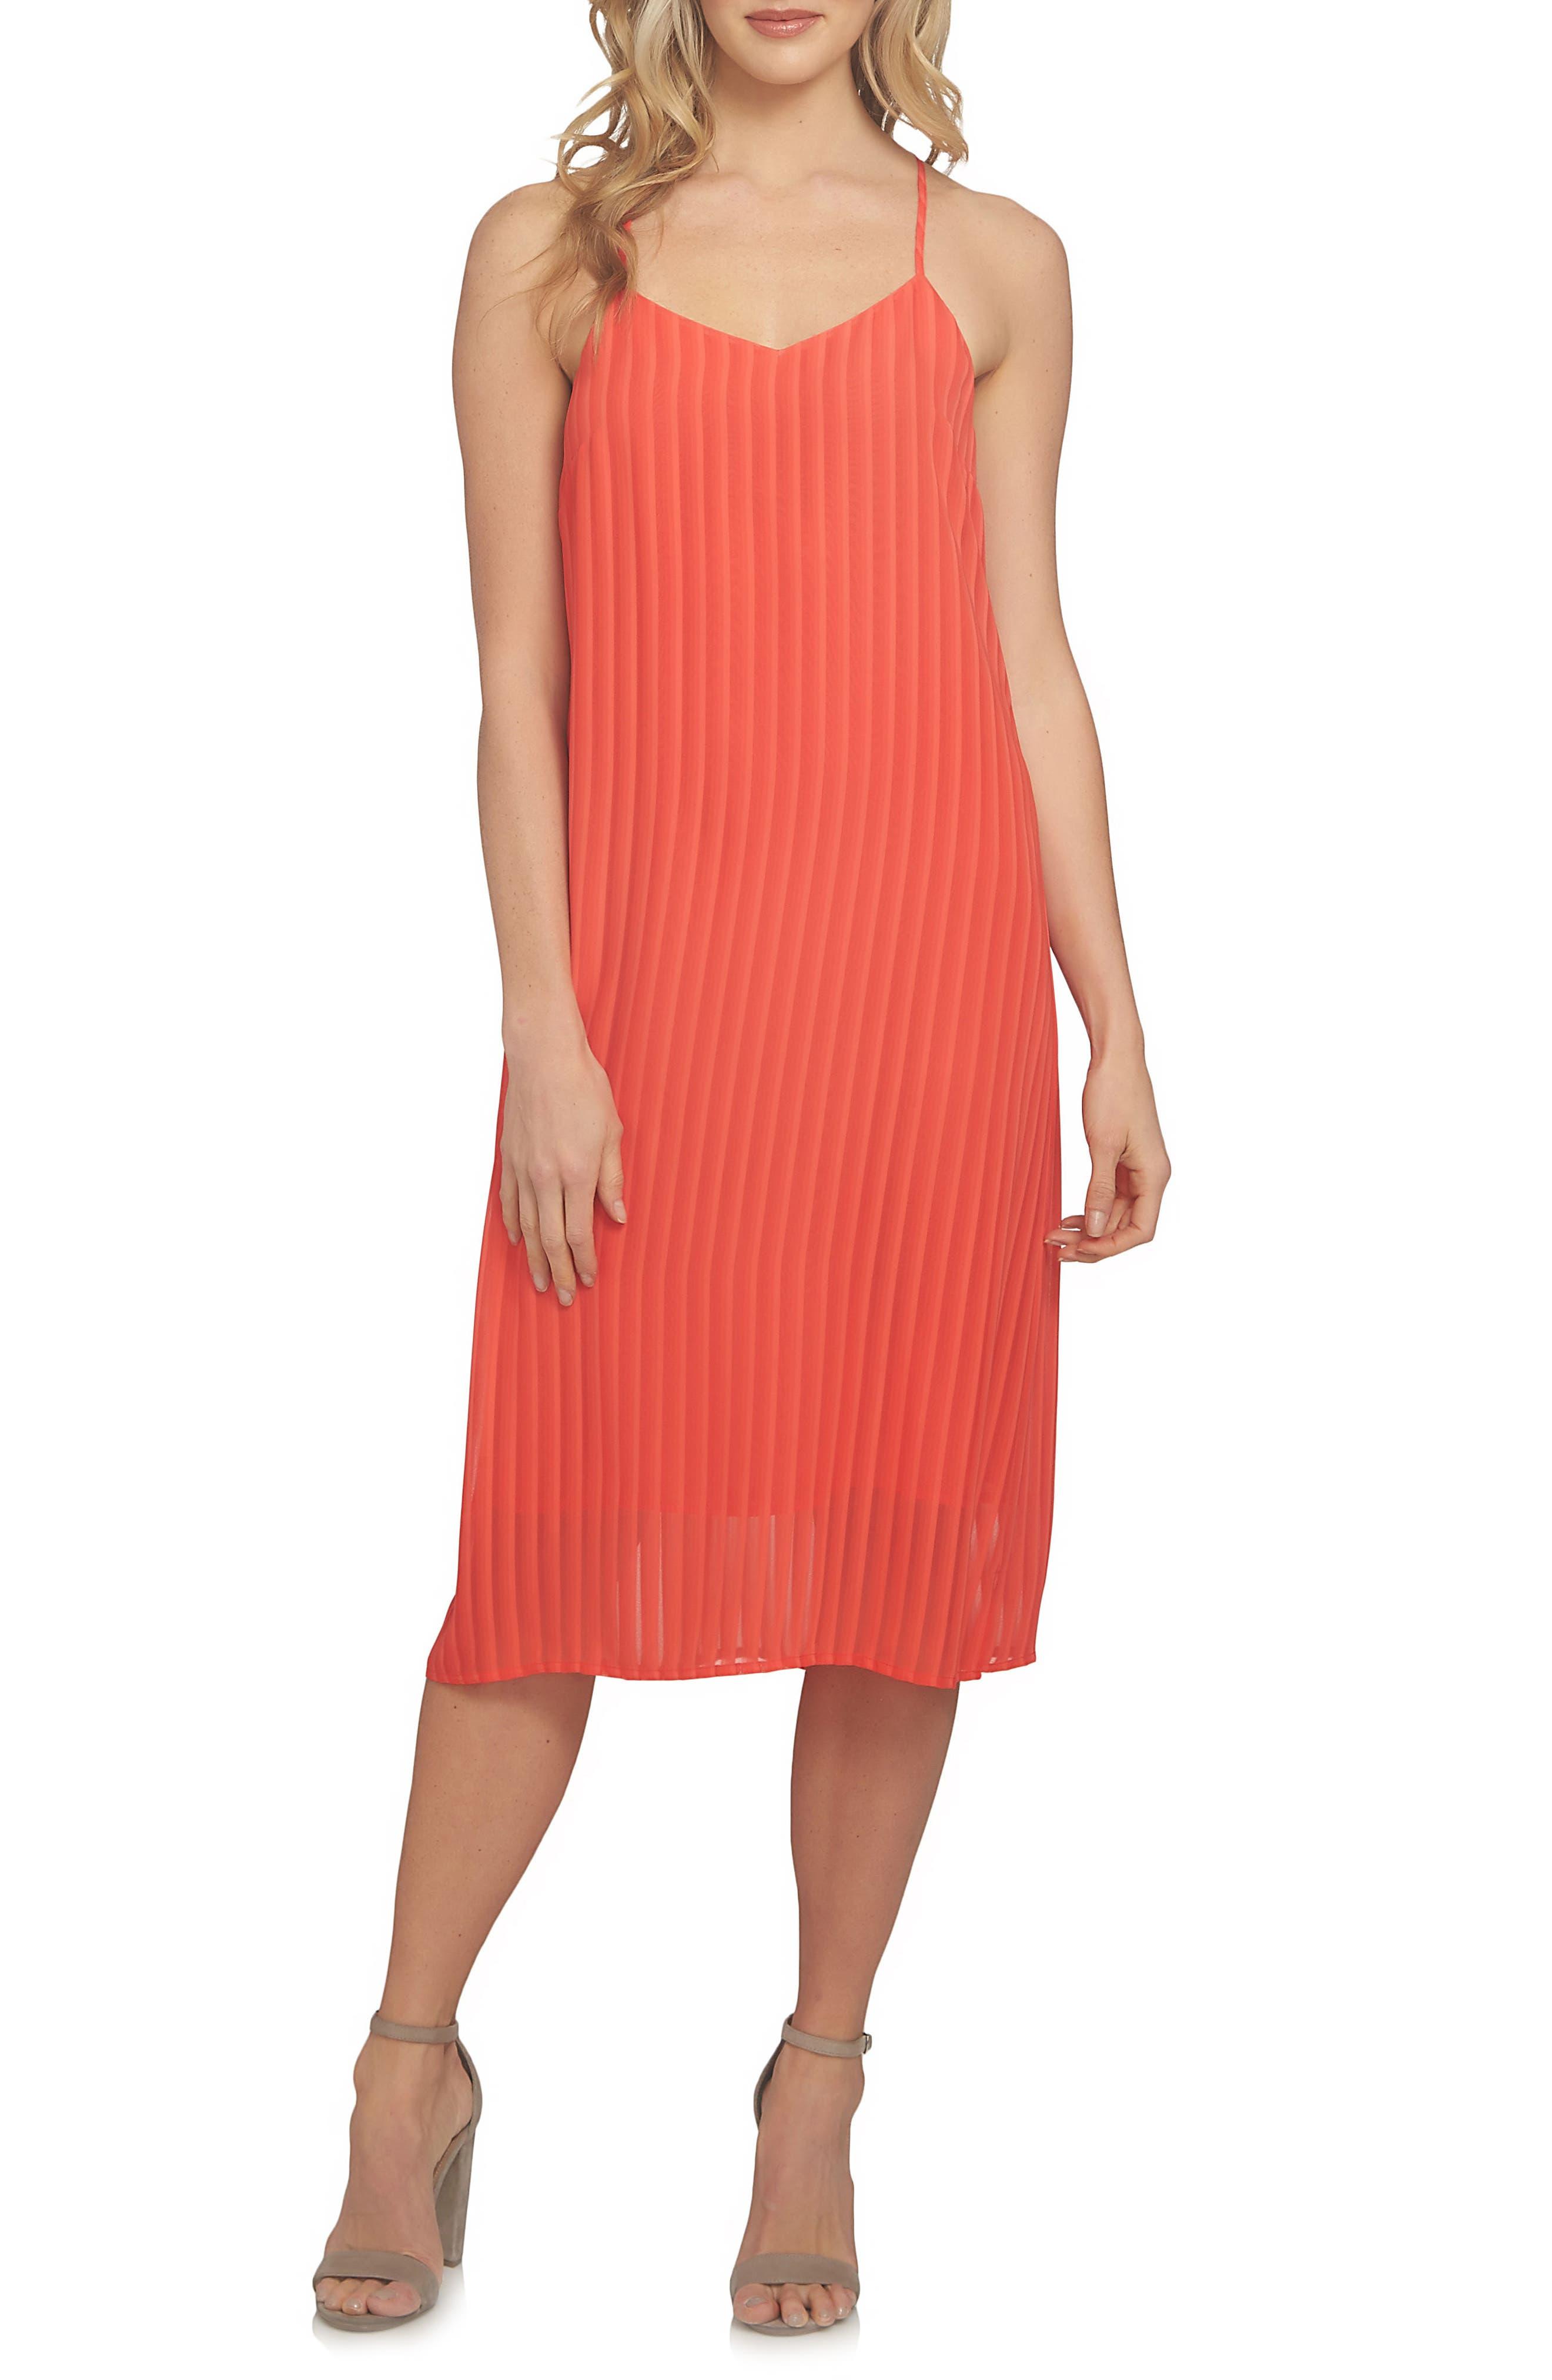 Lacey Chiffon Midi Dress,                         Main,                         color, Fiery Red